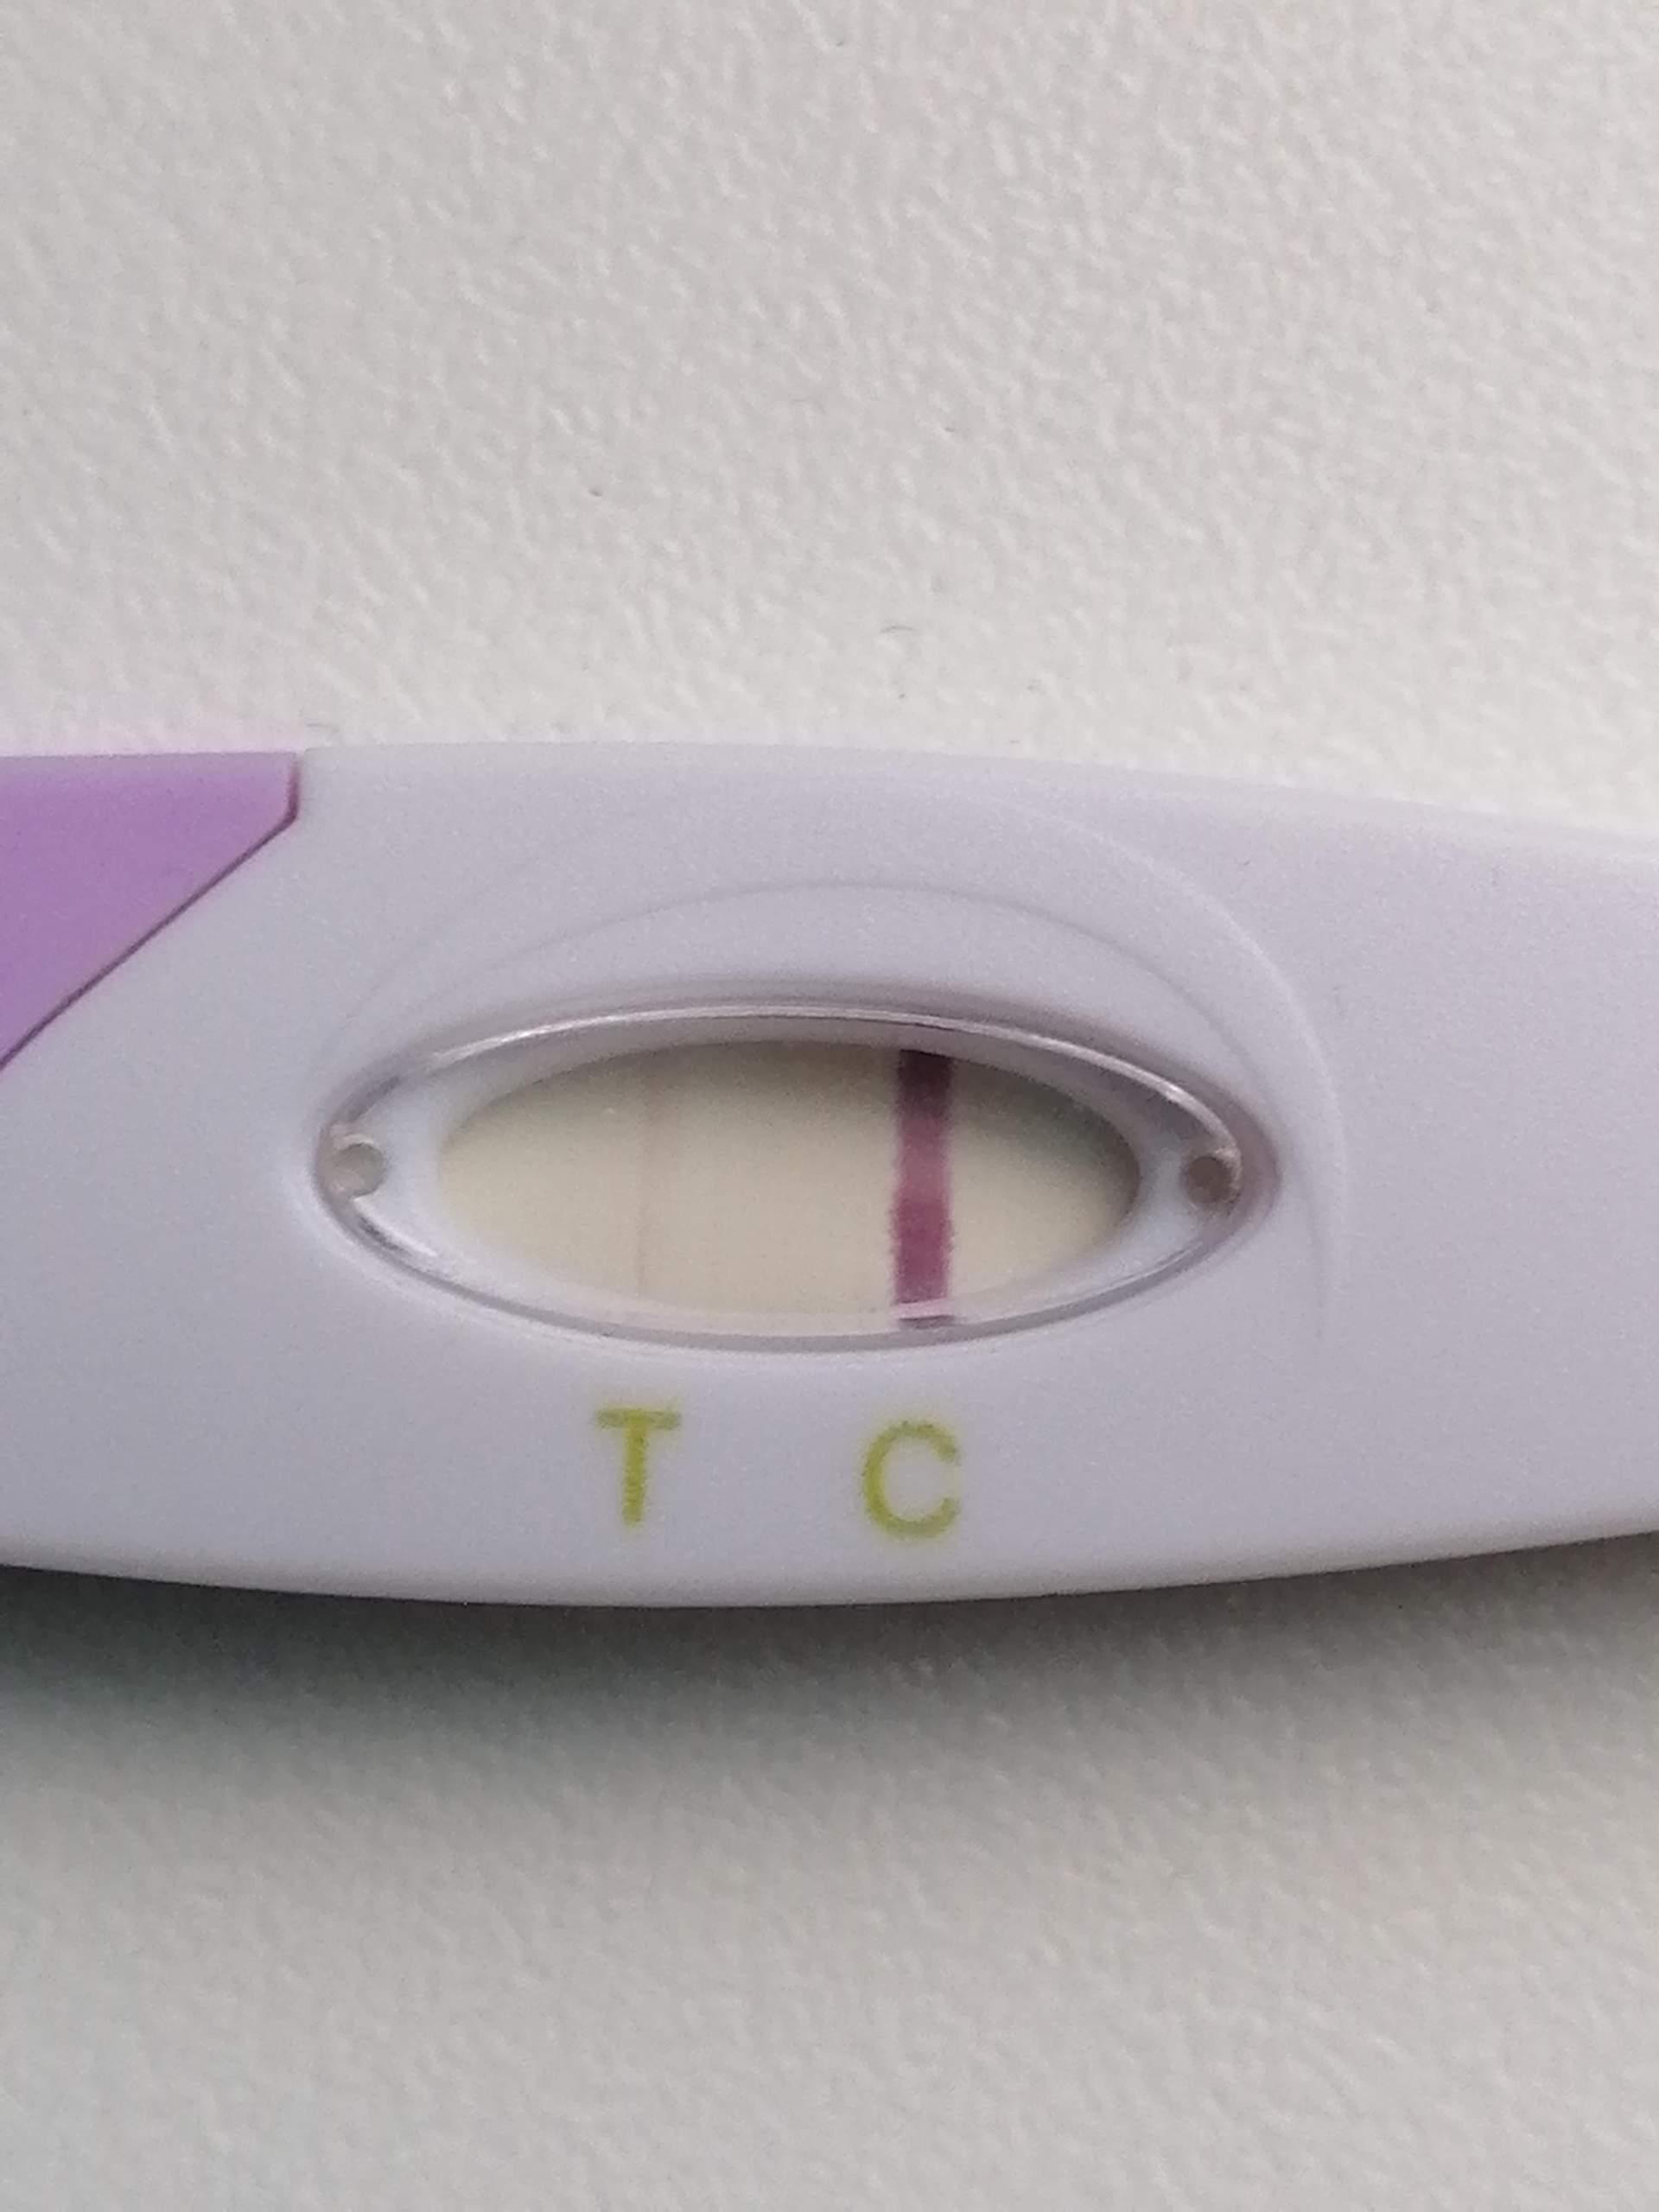 Easy verdunstungslinie clearblue Pregnancy Test